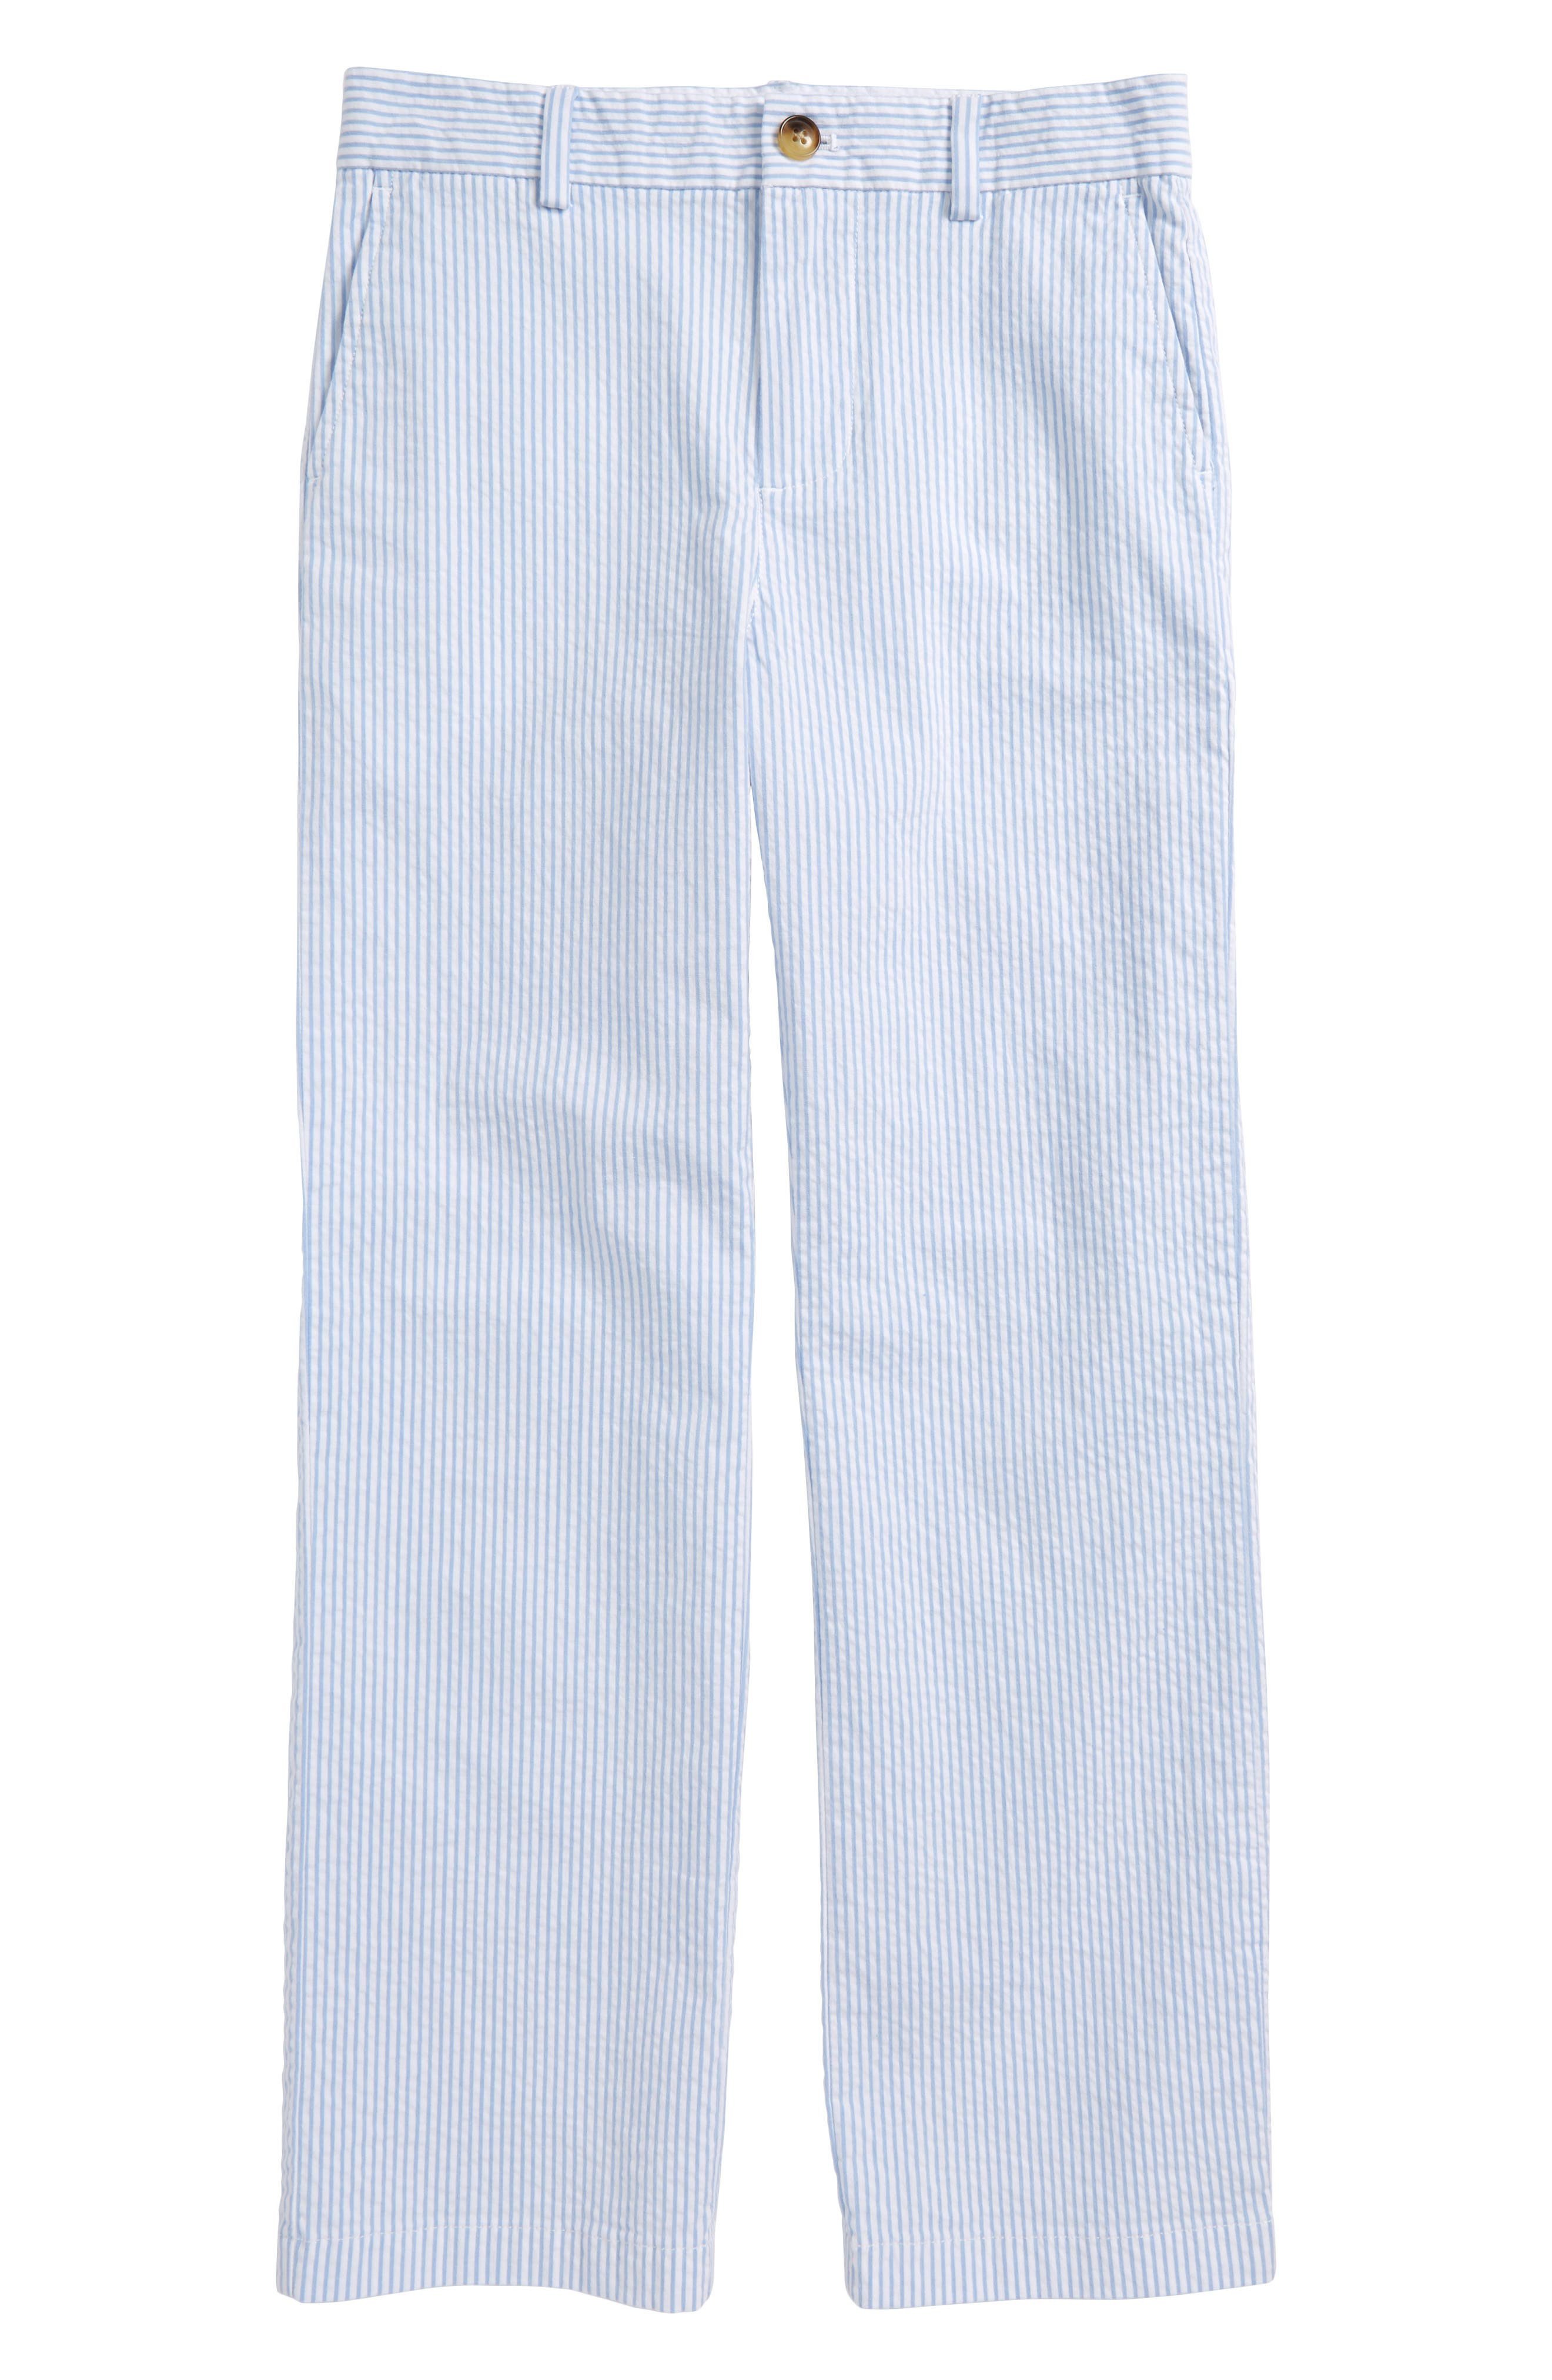 Seersucker Stripe Breaker Pants,                             Main thumbnail 1, color,                             Ocean Breeze